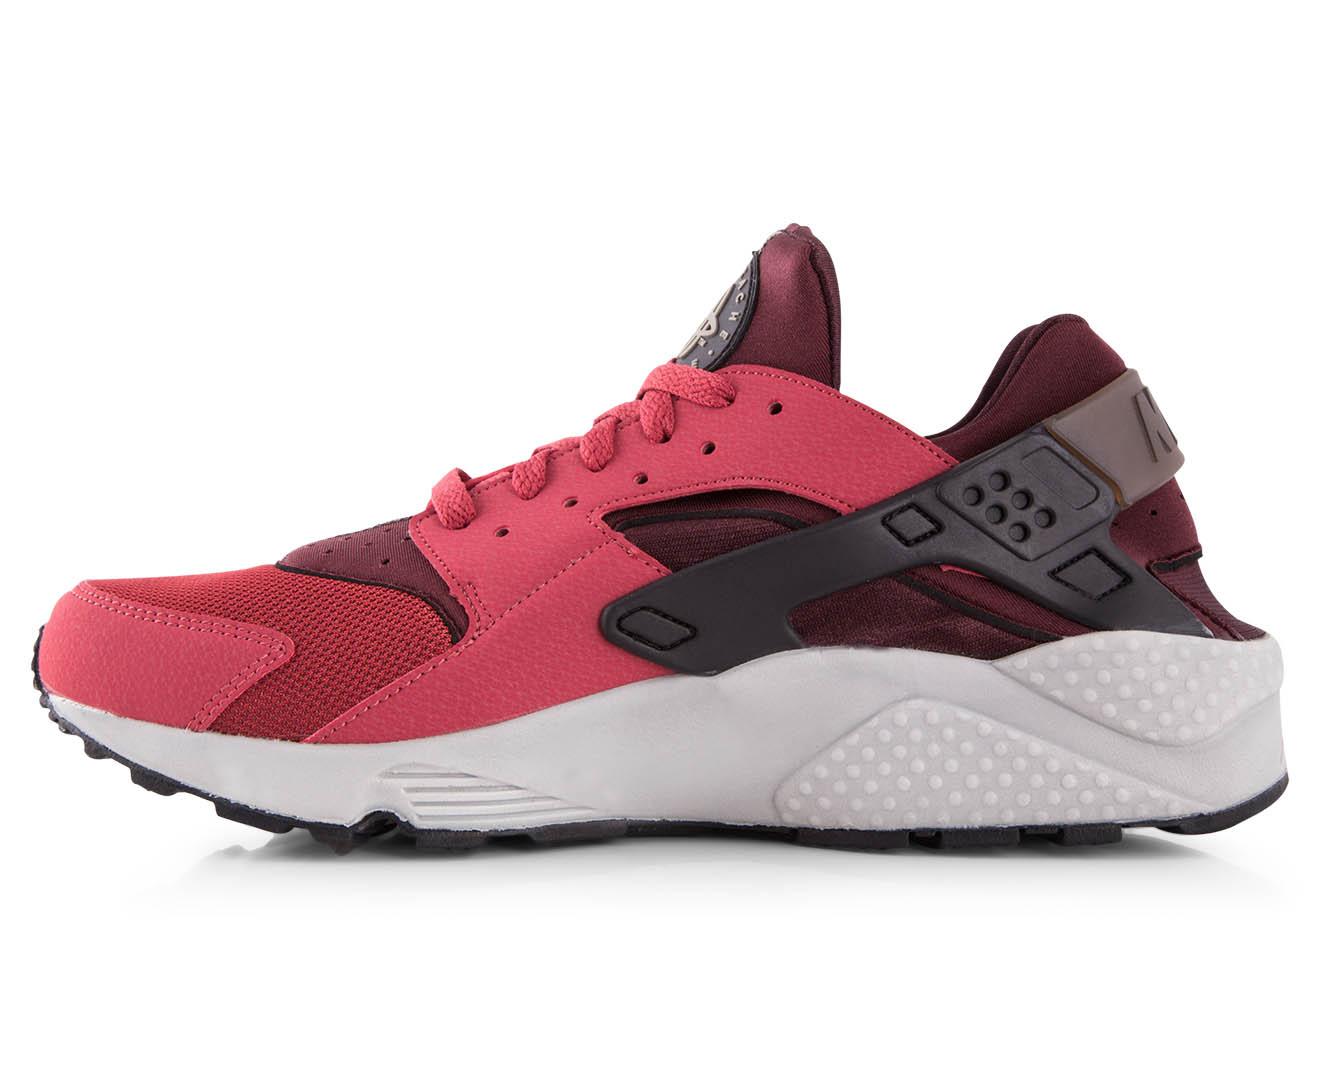 new arrival 47426 95c55 Nike Men s Huarache - Cedar Black Burgundy   Catch.com.au